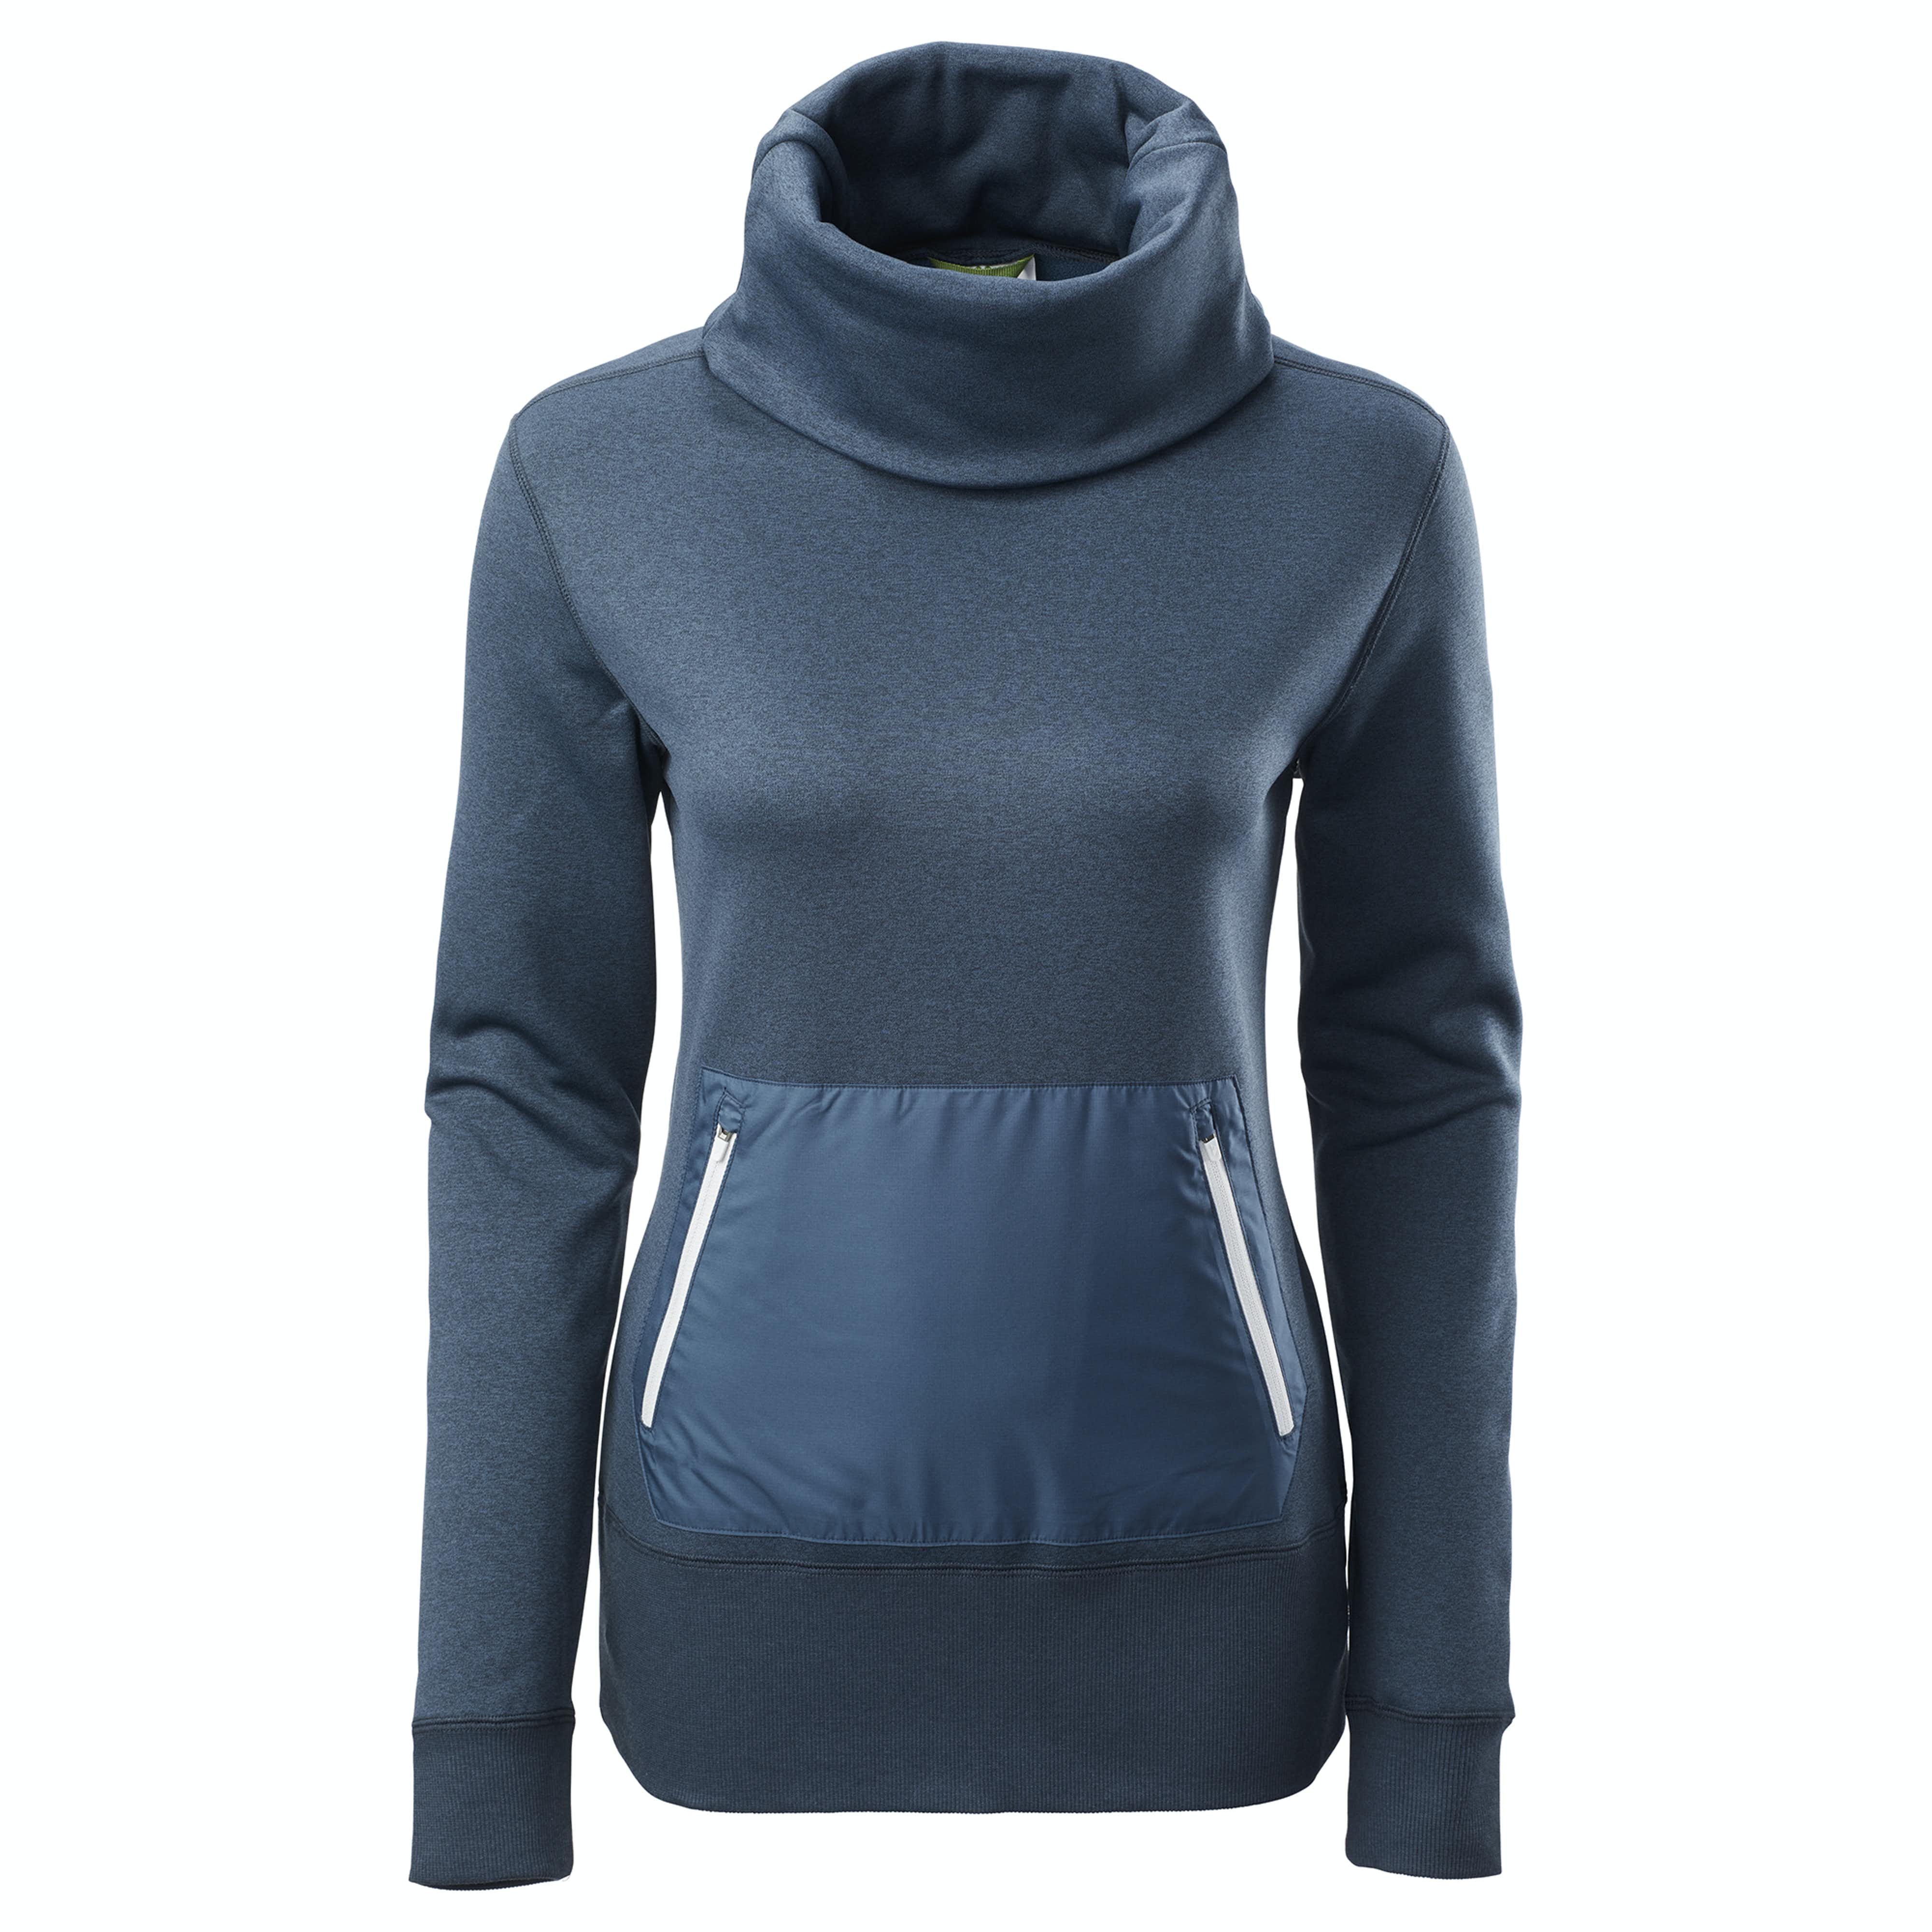 851de3bfc6dc Clearance of Women's Outdoor Clothing & Gear   Kathmandu AU